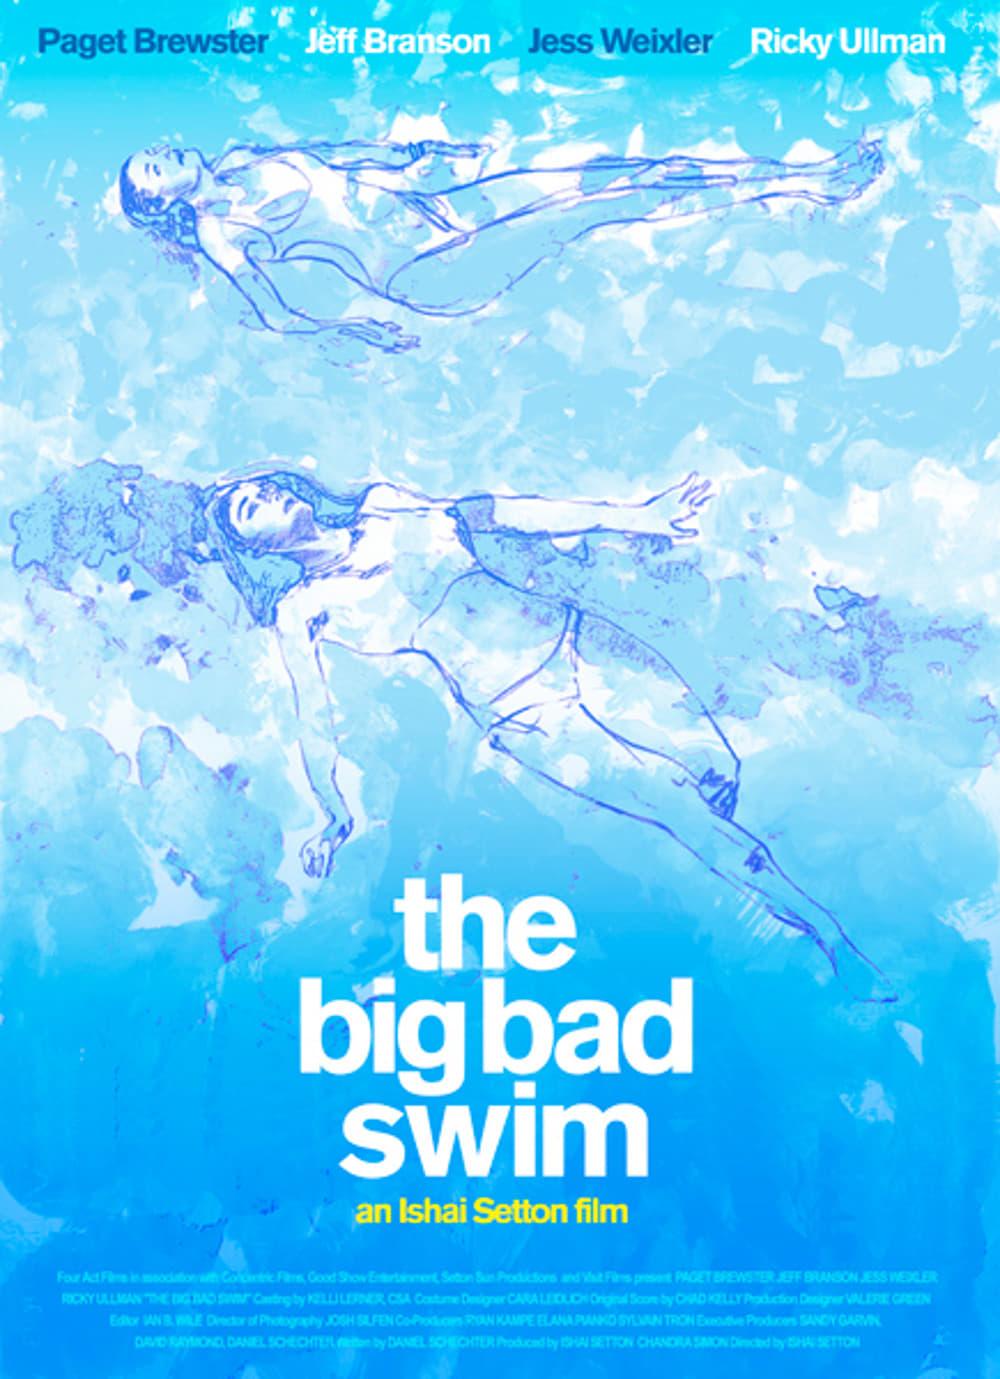 affiche du film The Big Bad Swim